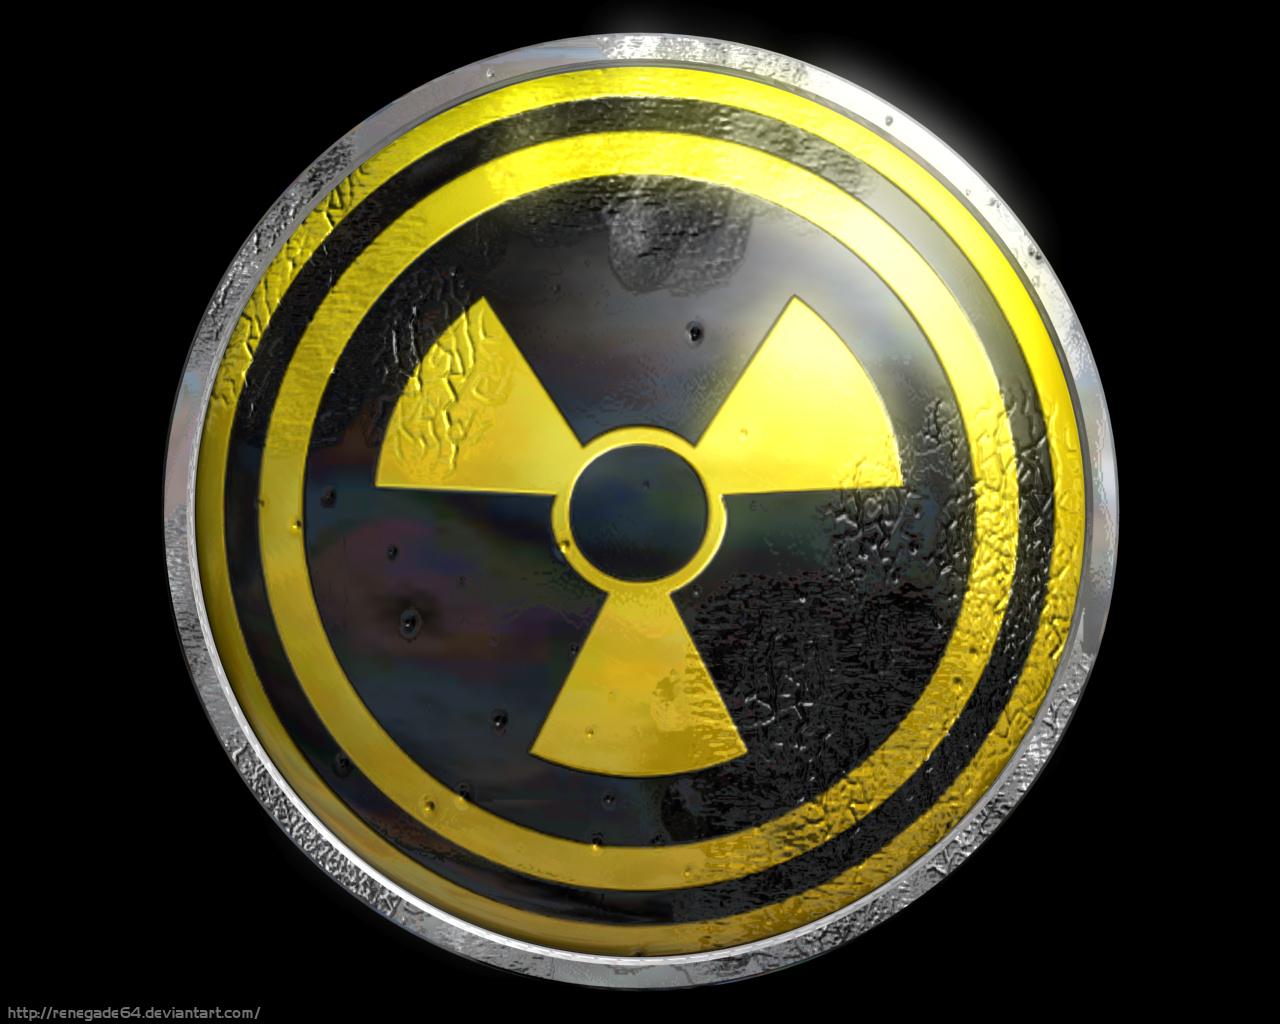 1920x1080 radiation sign symbol - photo #18